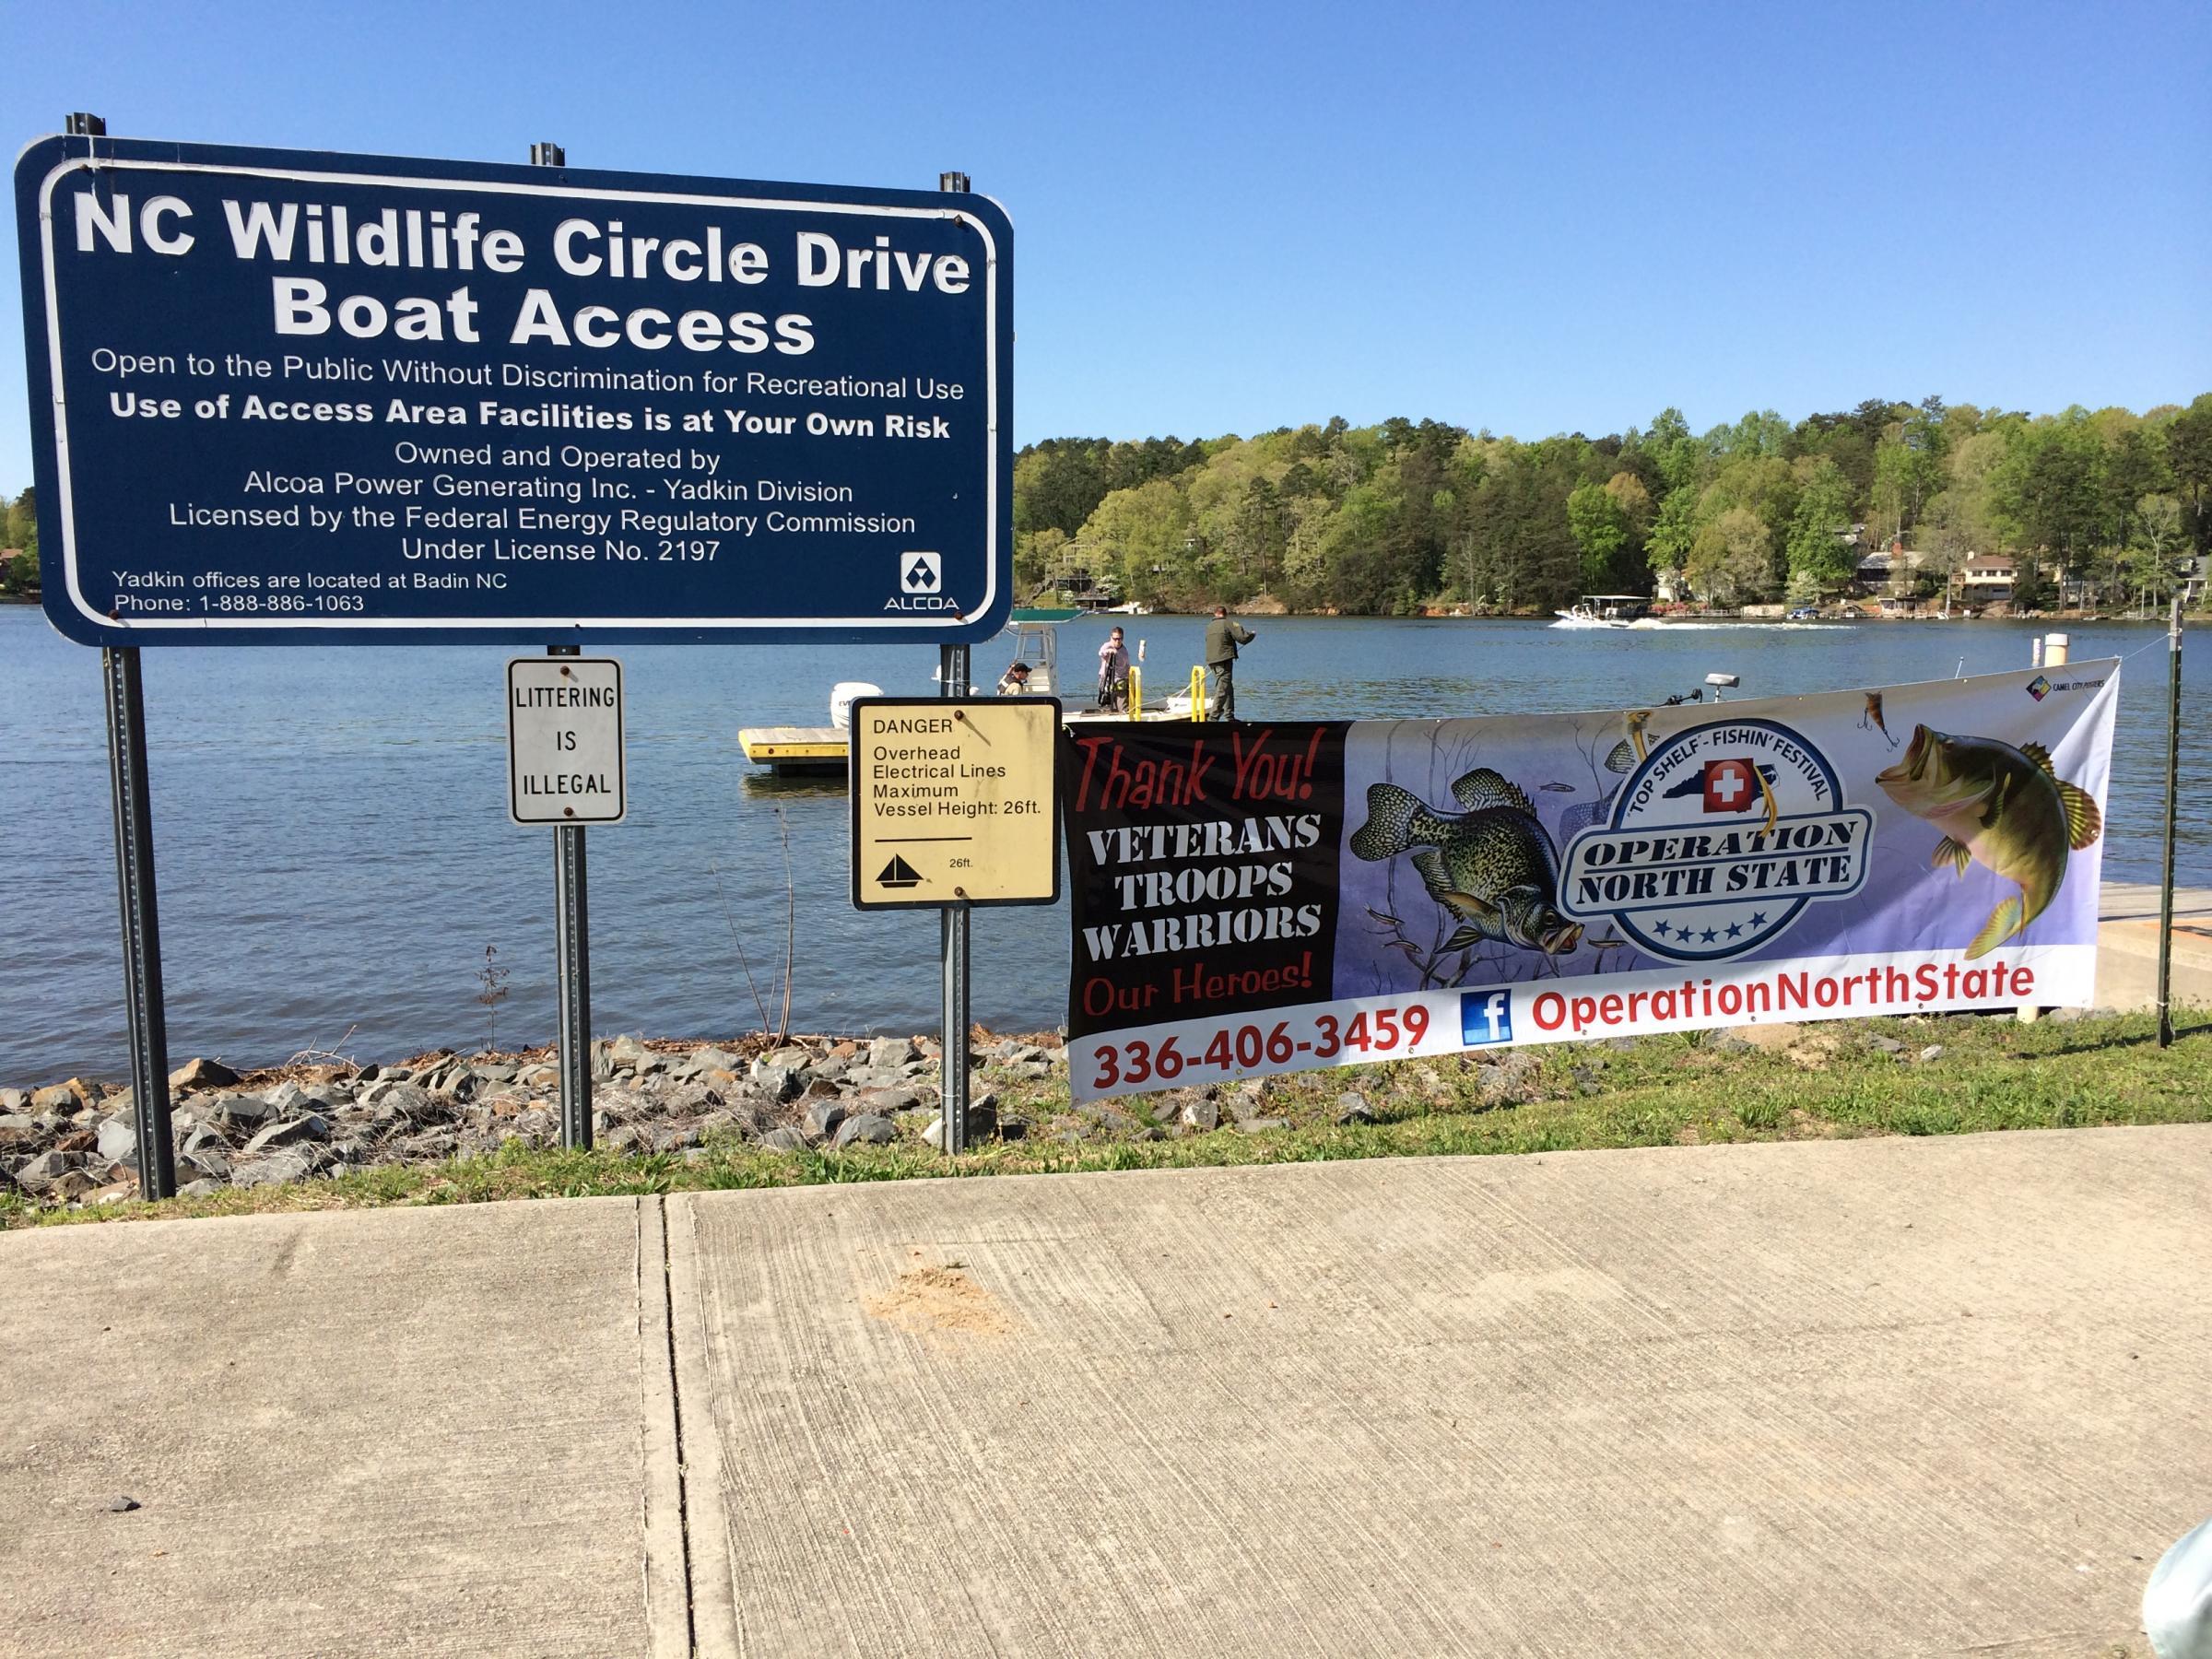 Volunteers Take Wounded Troops Veterans Fishing At Badin Lake Wfae